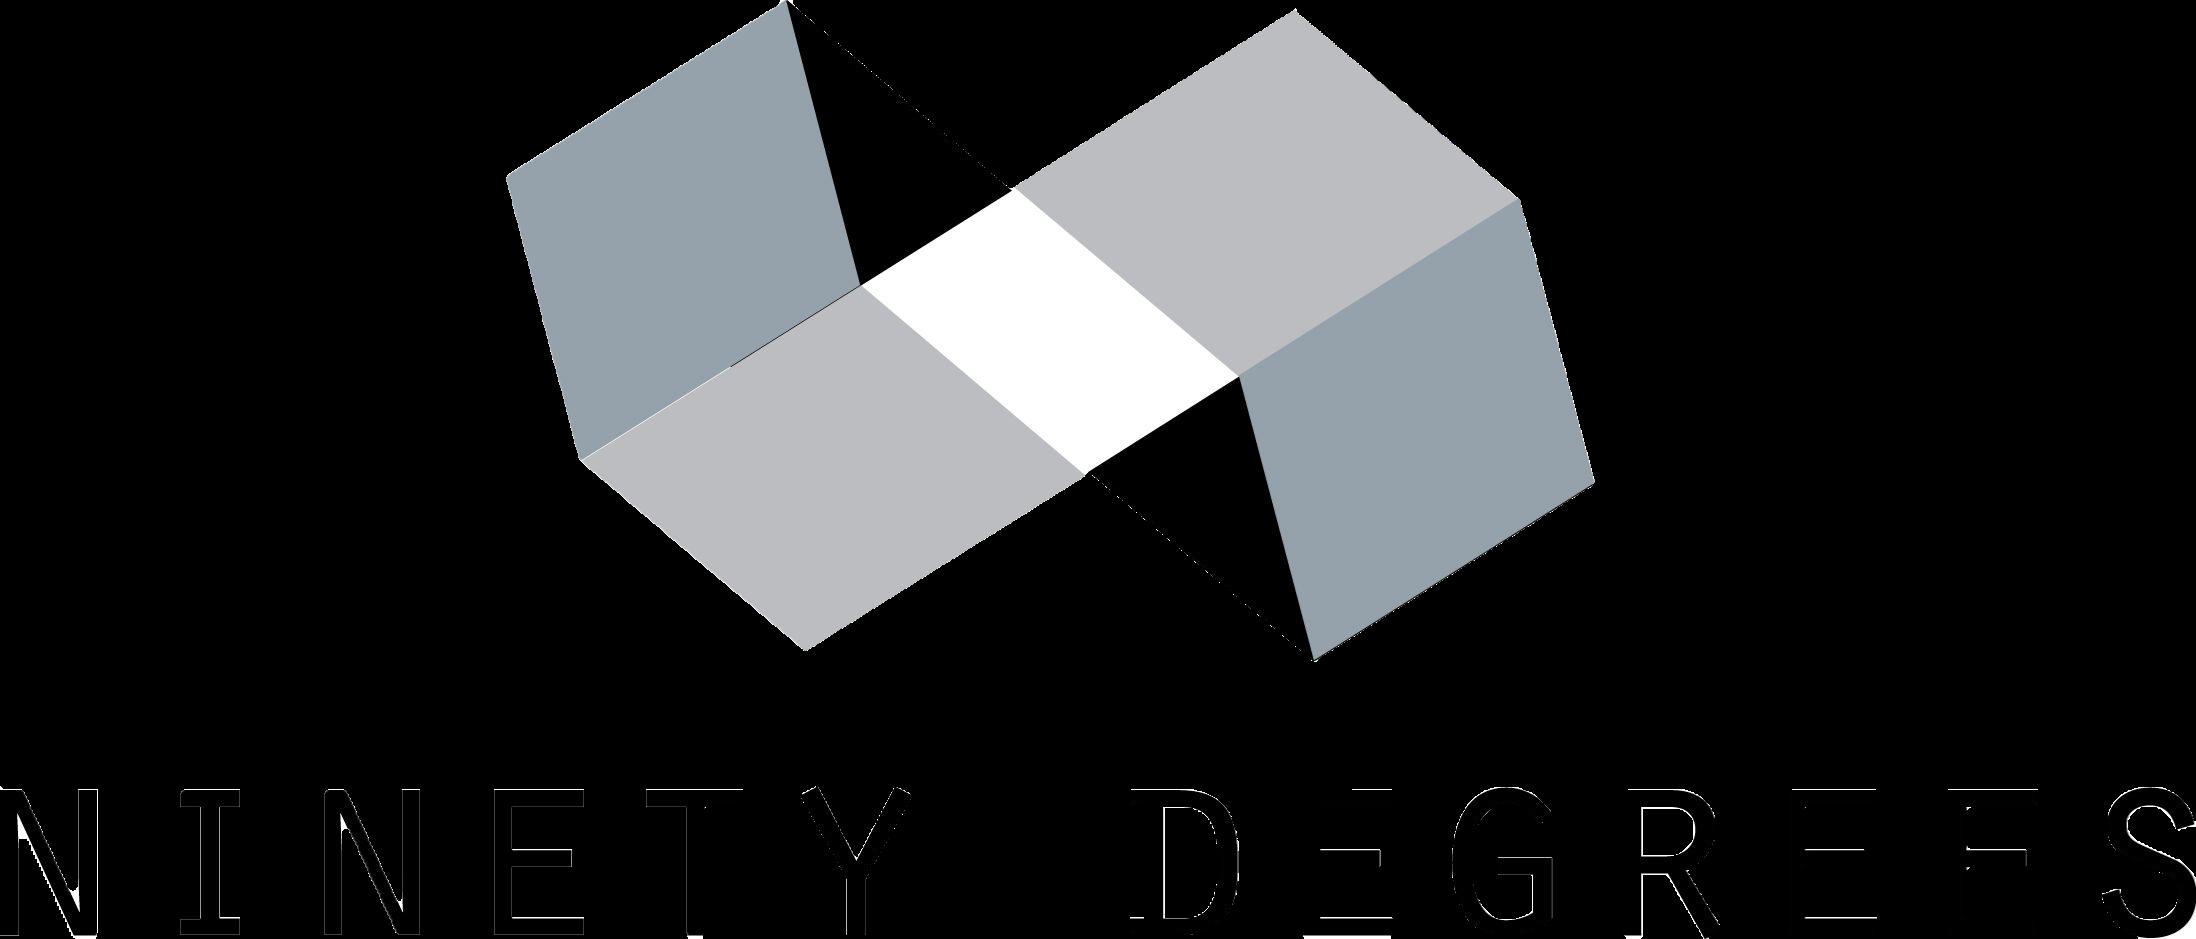 Phoenix Property Logo 47